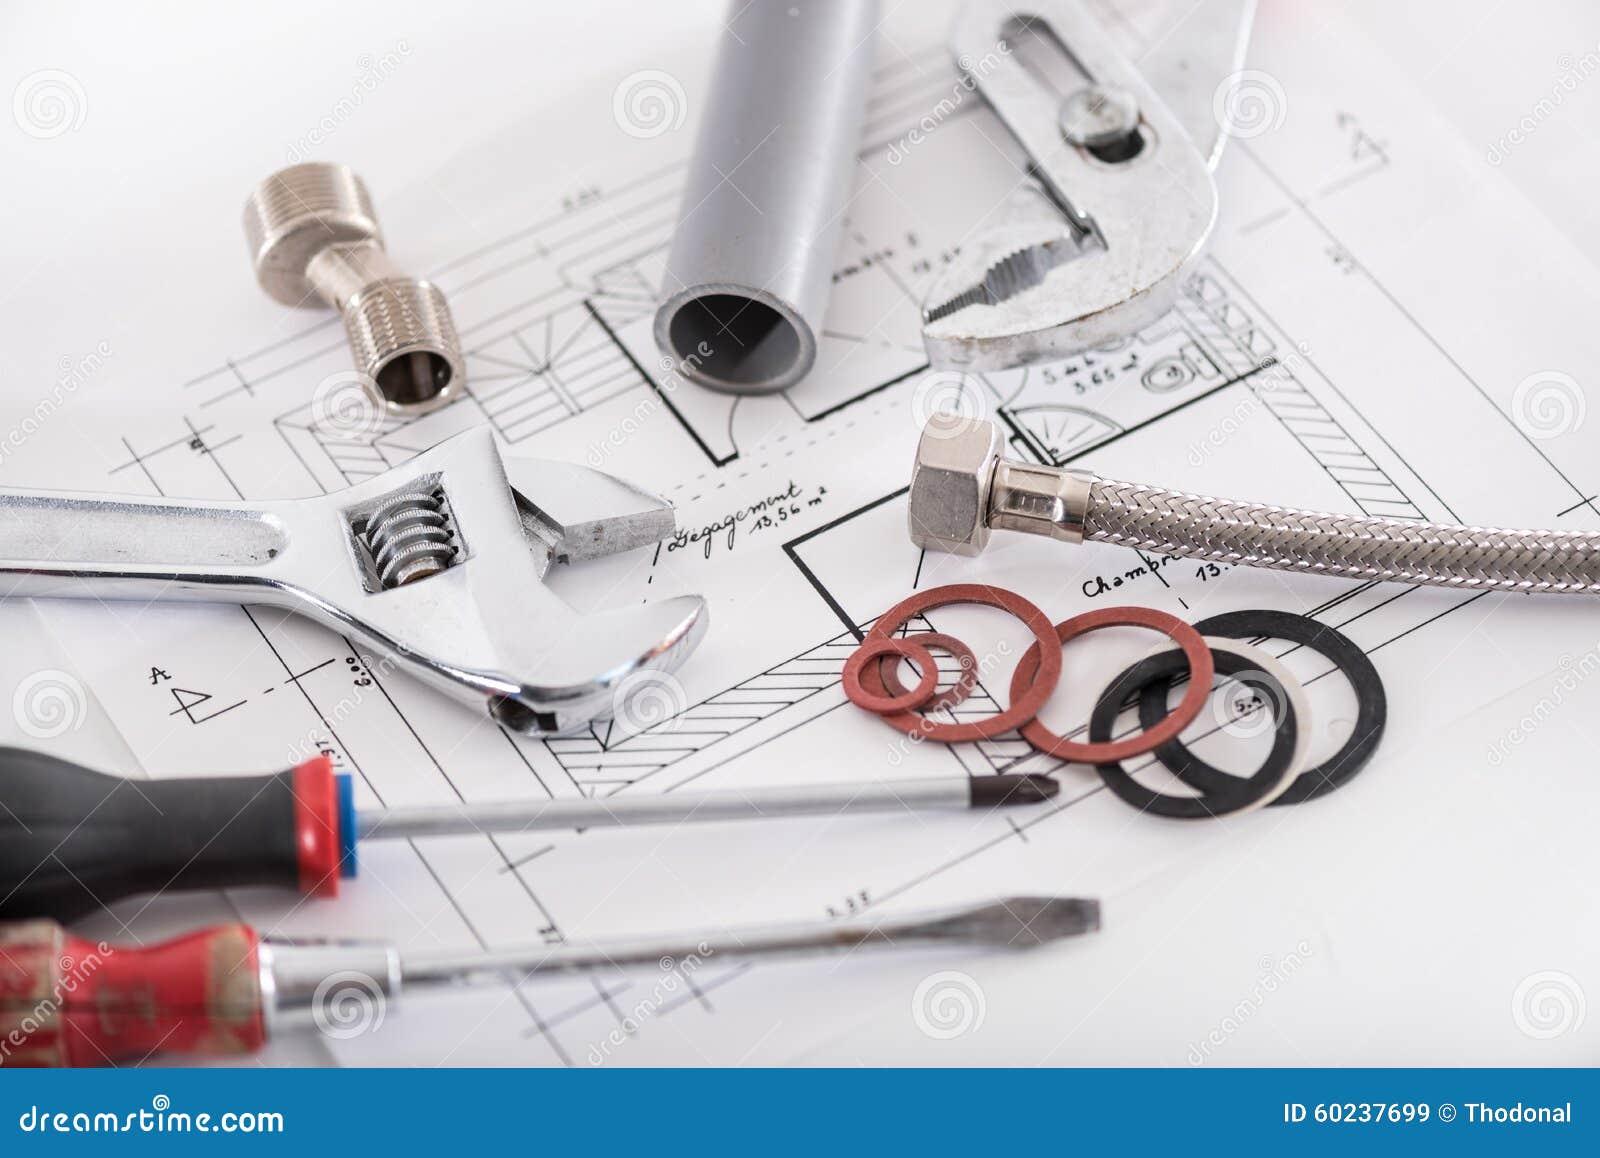 Reeks loodgieterswerkmaterialen